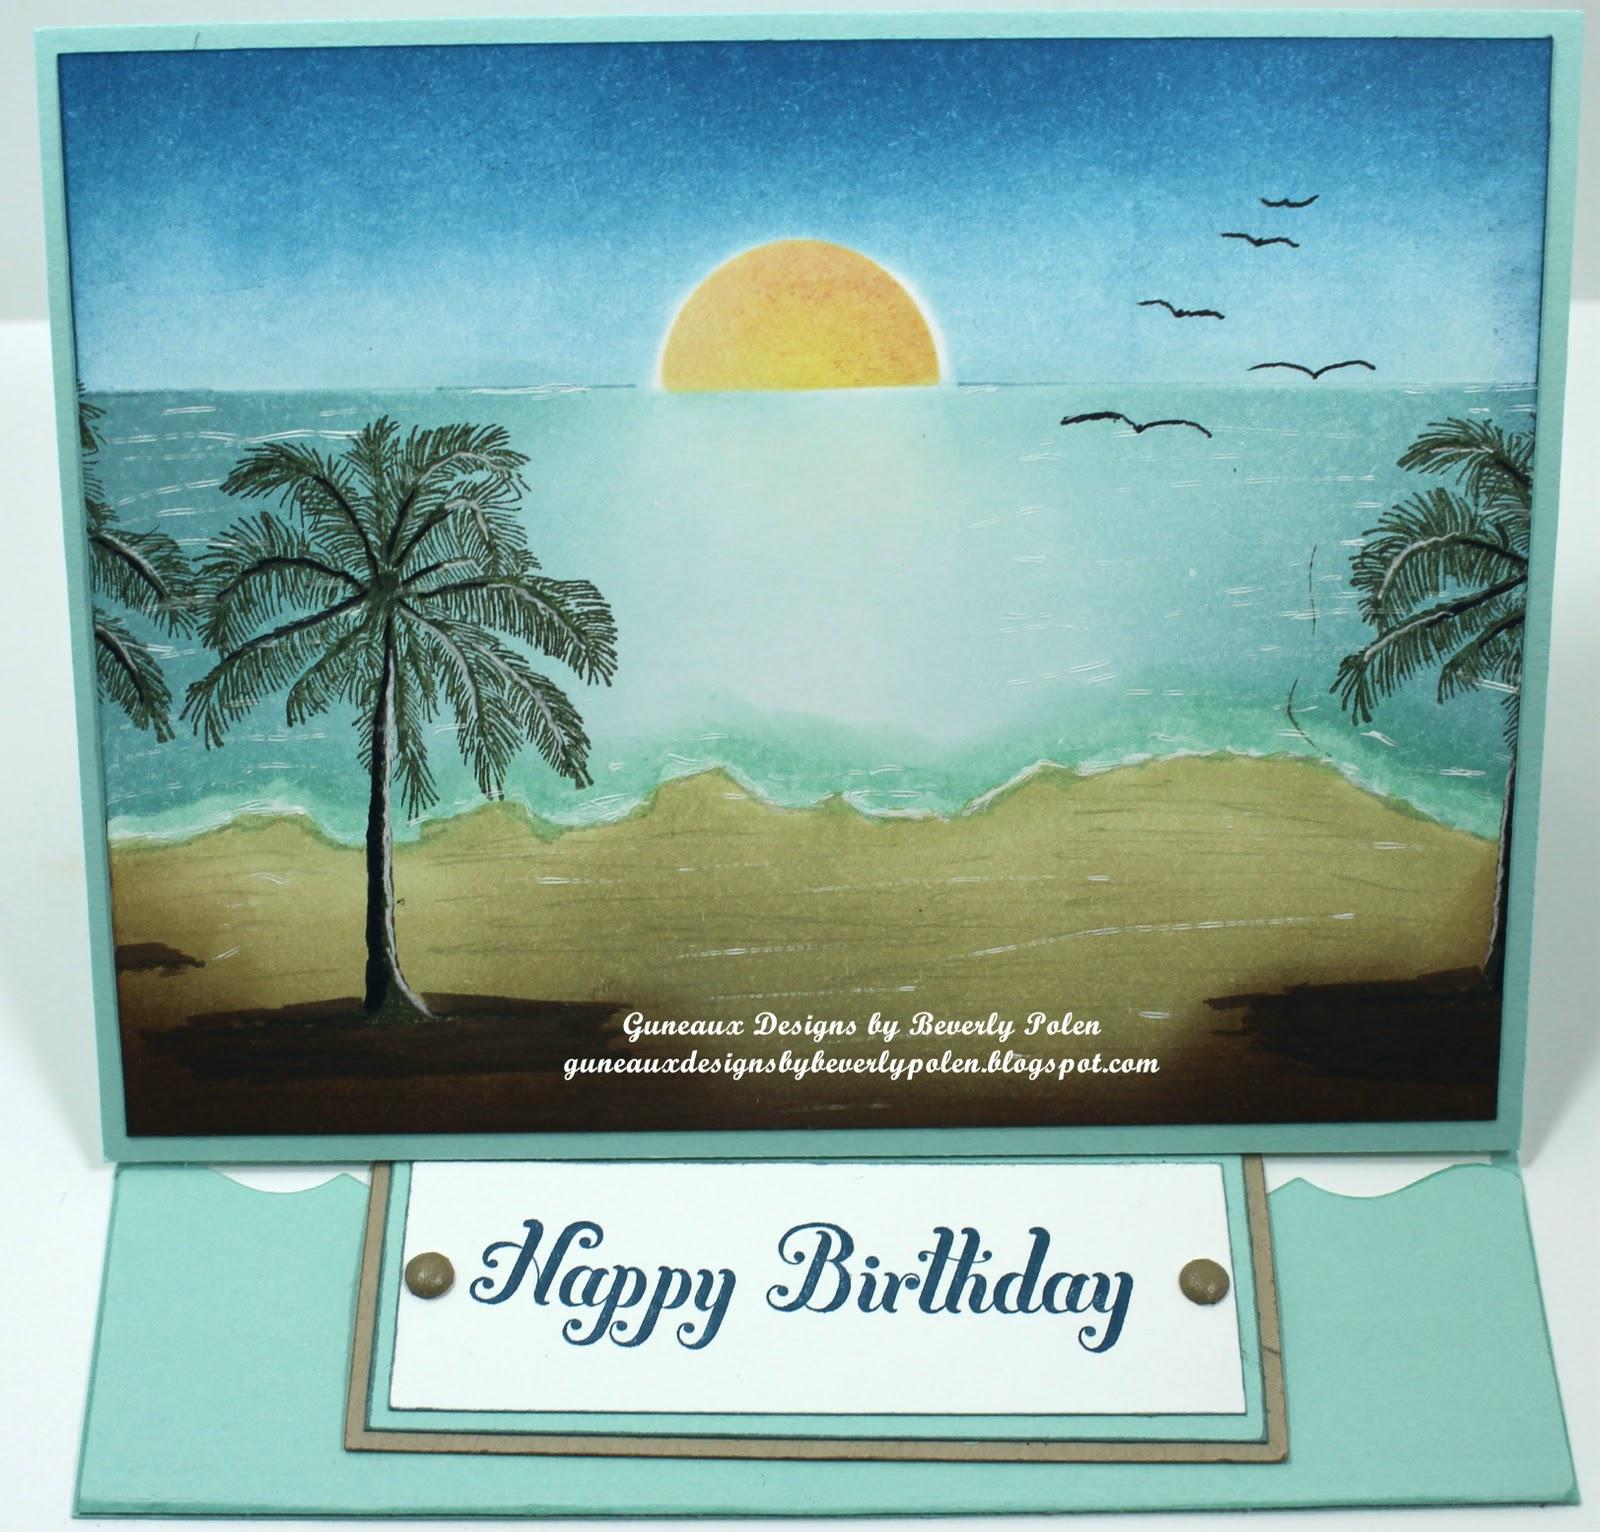 Birthday Card Sayings Beach : Guneaux designs by beverly polen brayered beach